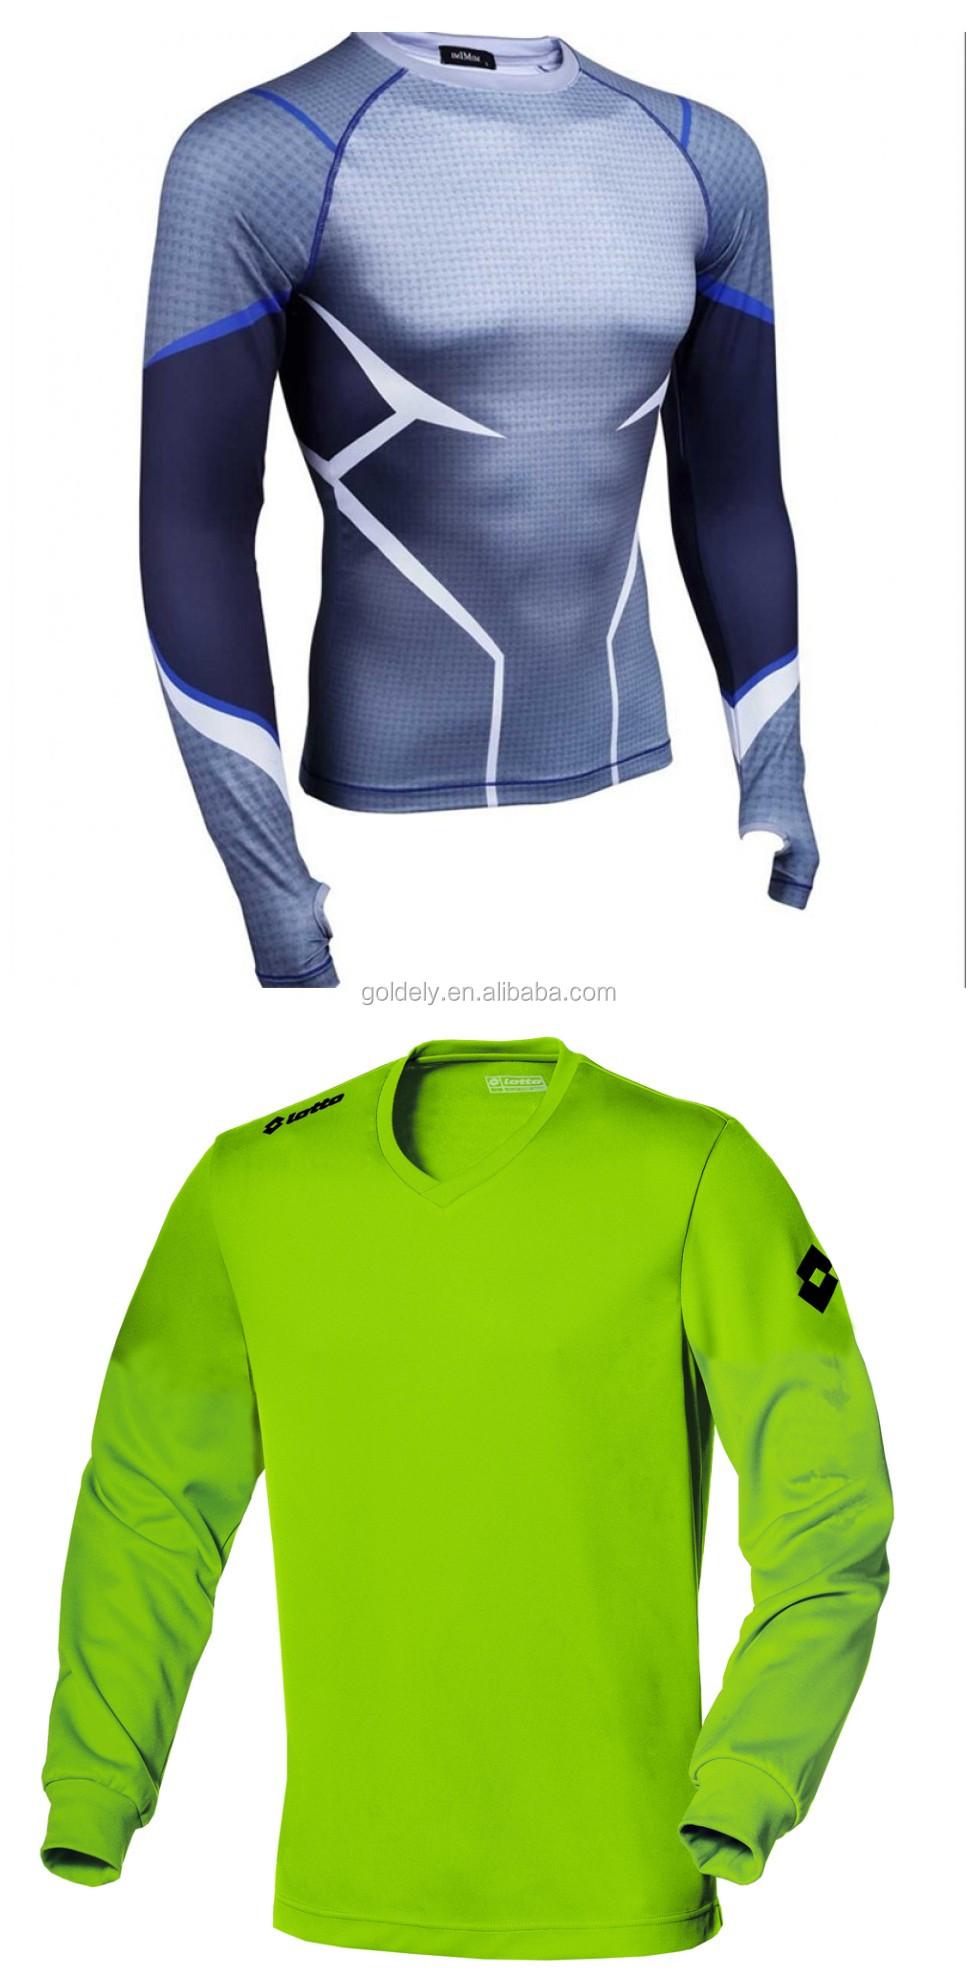 timper1hero_the_avengers_quicksilver_cosplaysport_tight_tops_cosplaytee_shirt01_.jpg